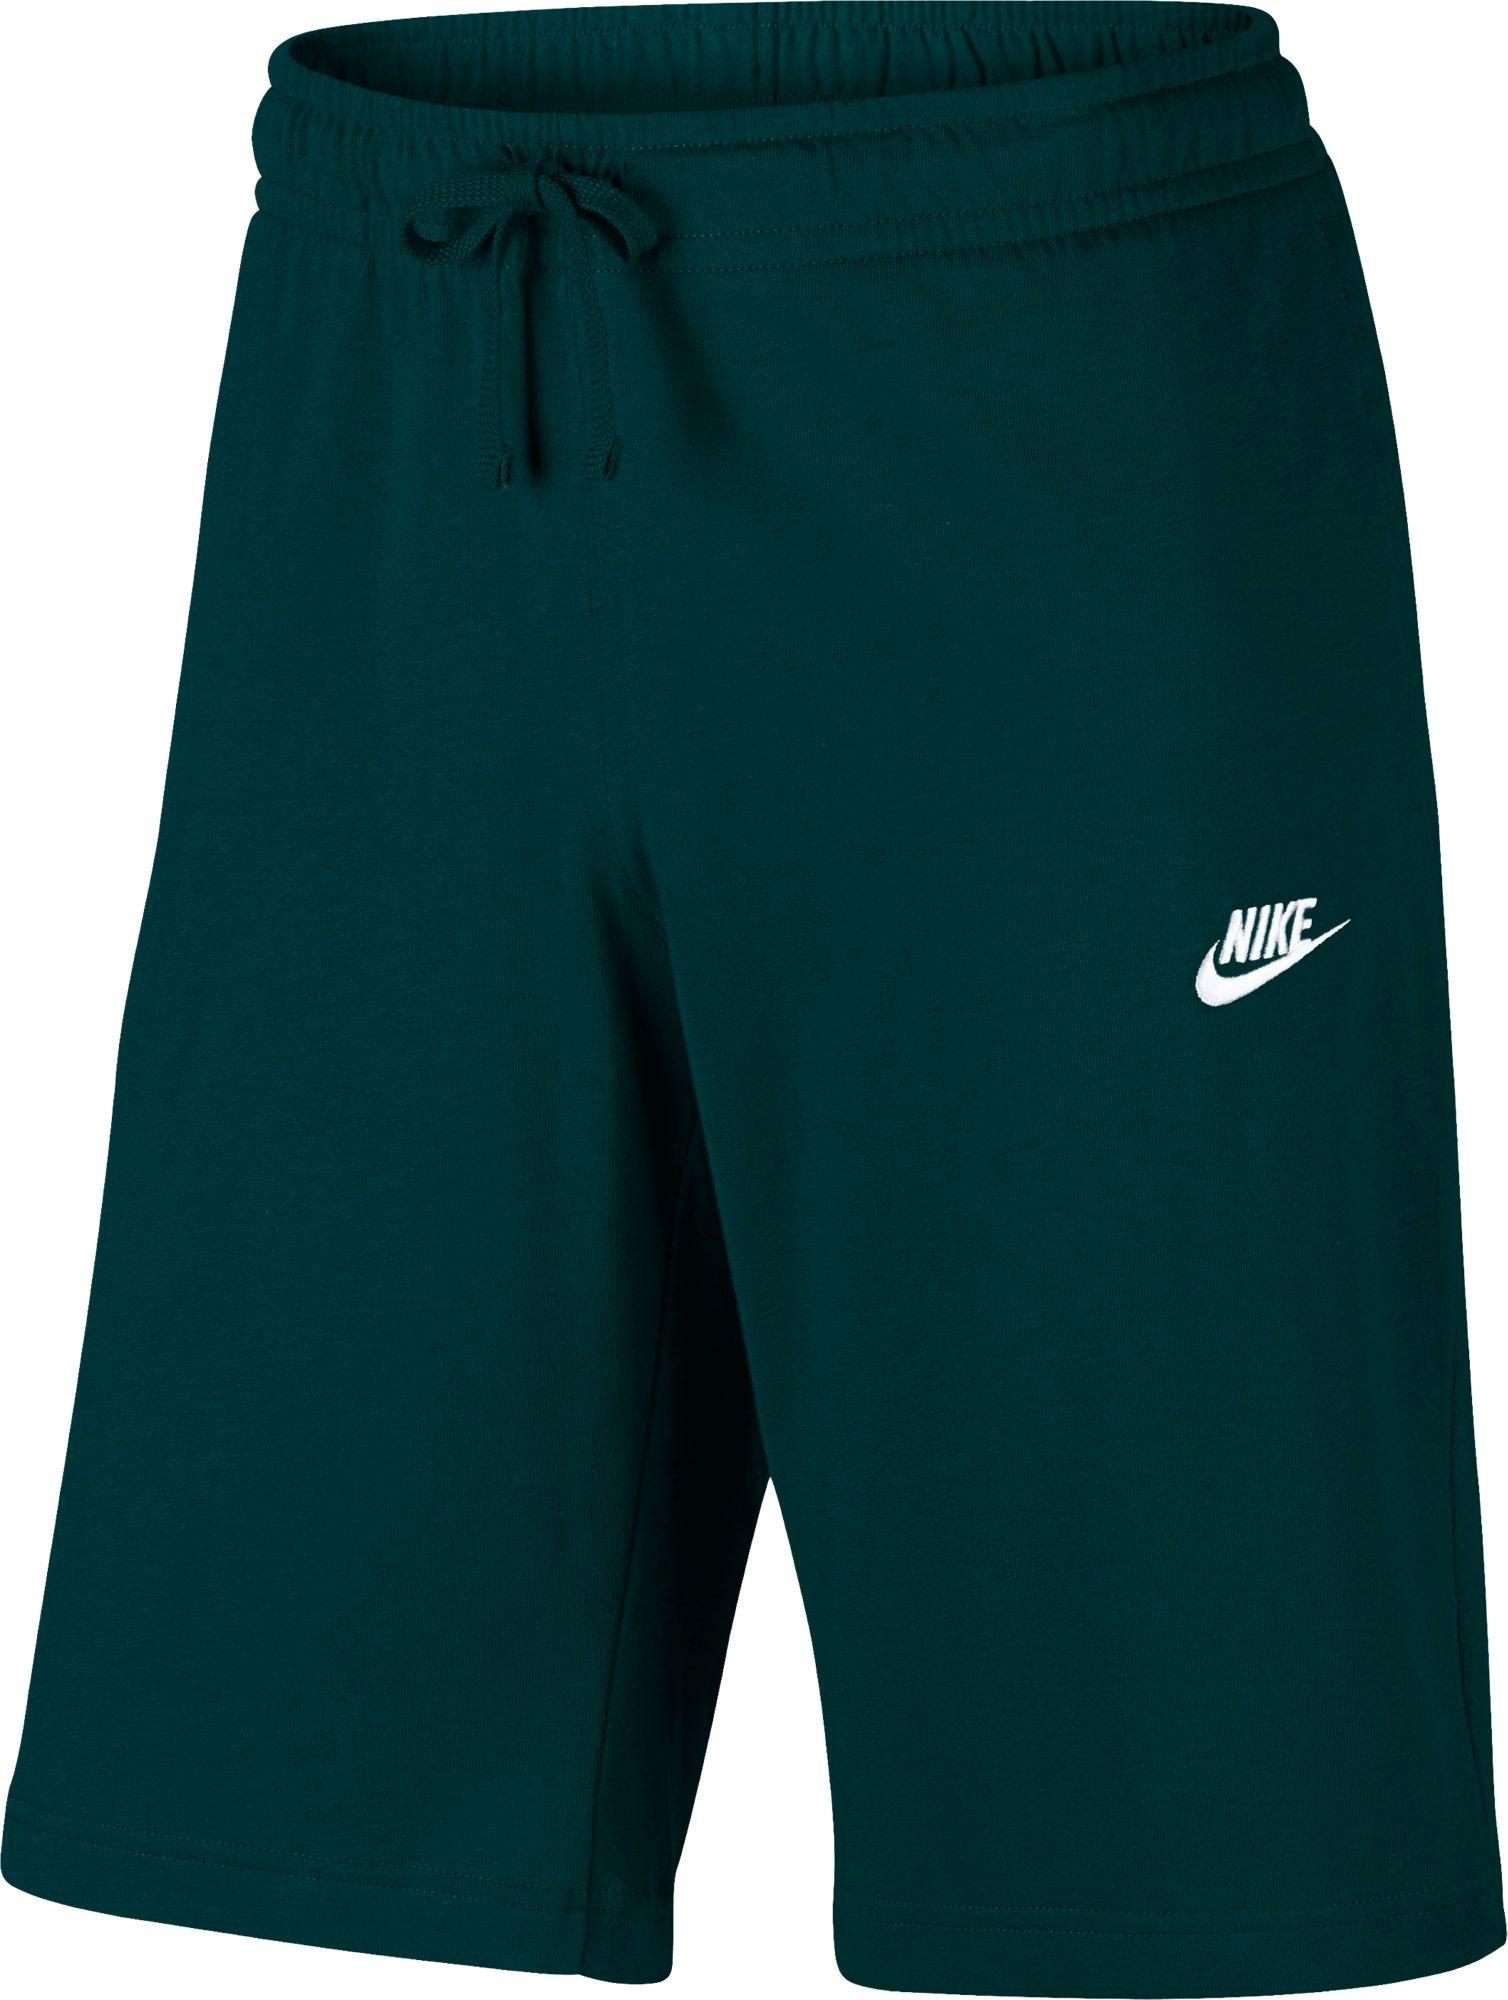 Nike Men's Sportswear Jersey Club Shorts | DICK'S Sporting Goods